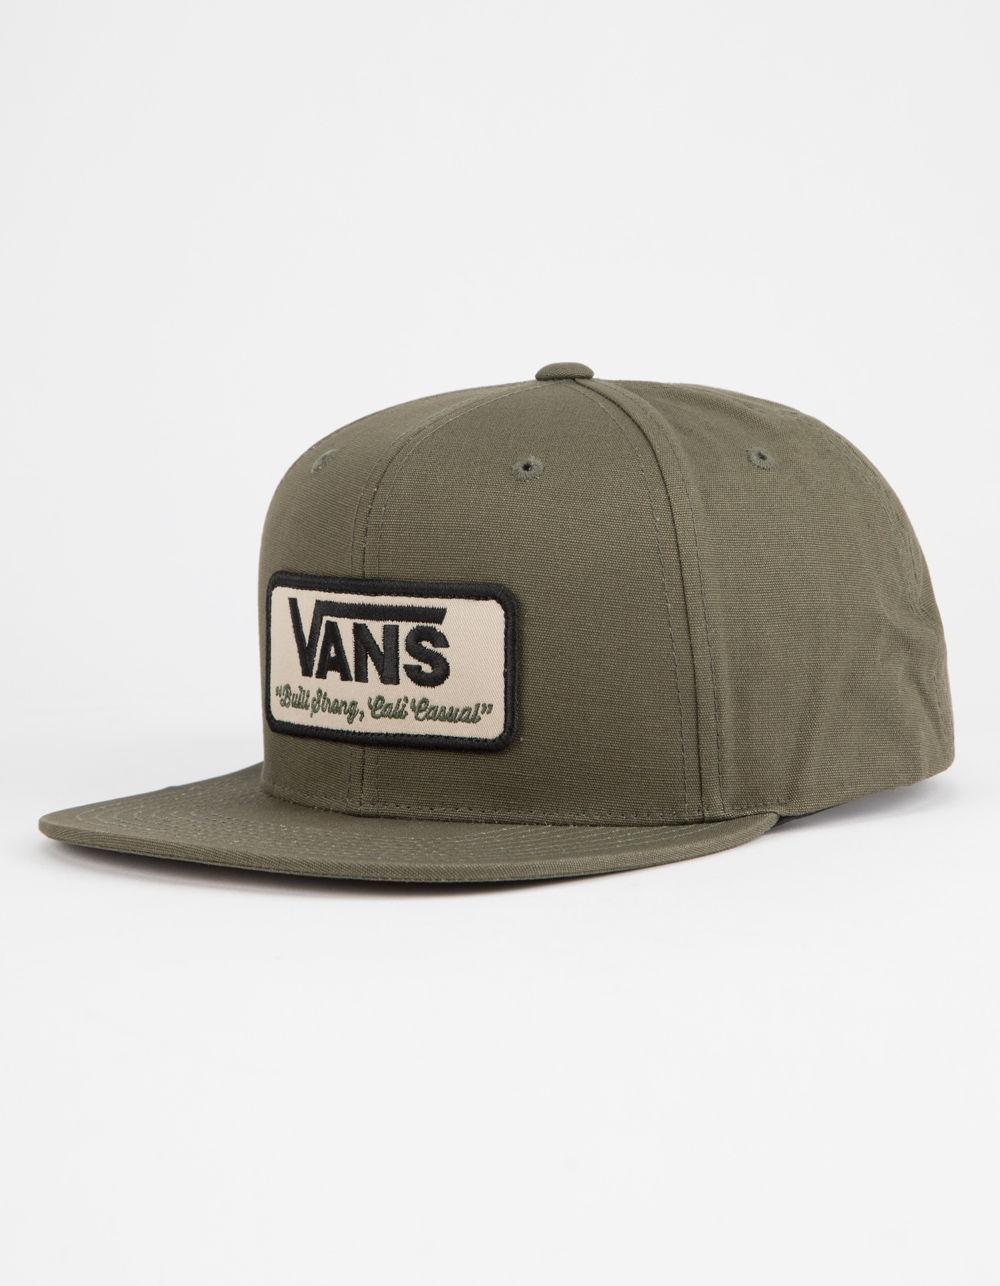 86519d50 Vans Rowley Grape Leaf Mens Snapback Hat in Green for Men - Lyst